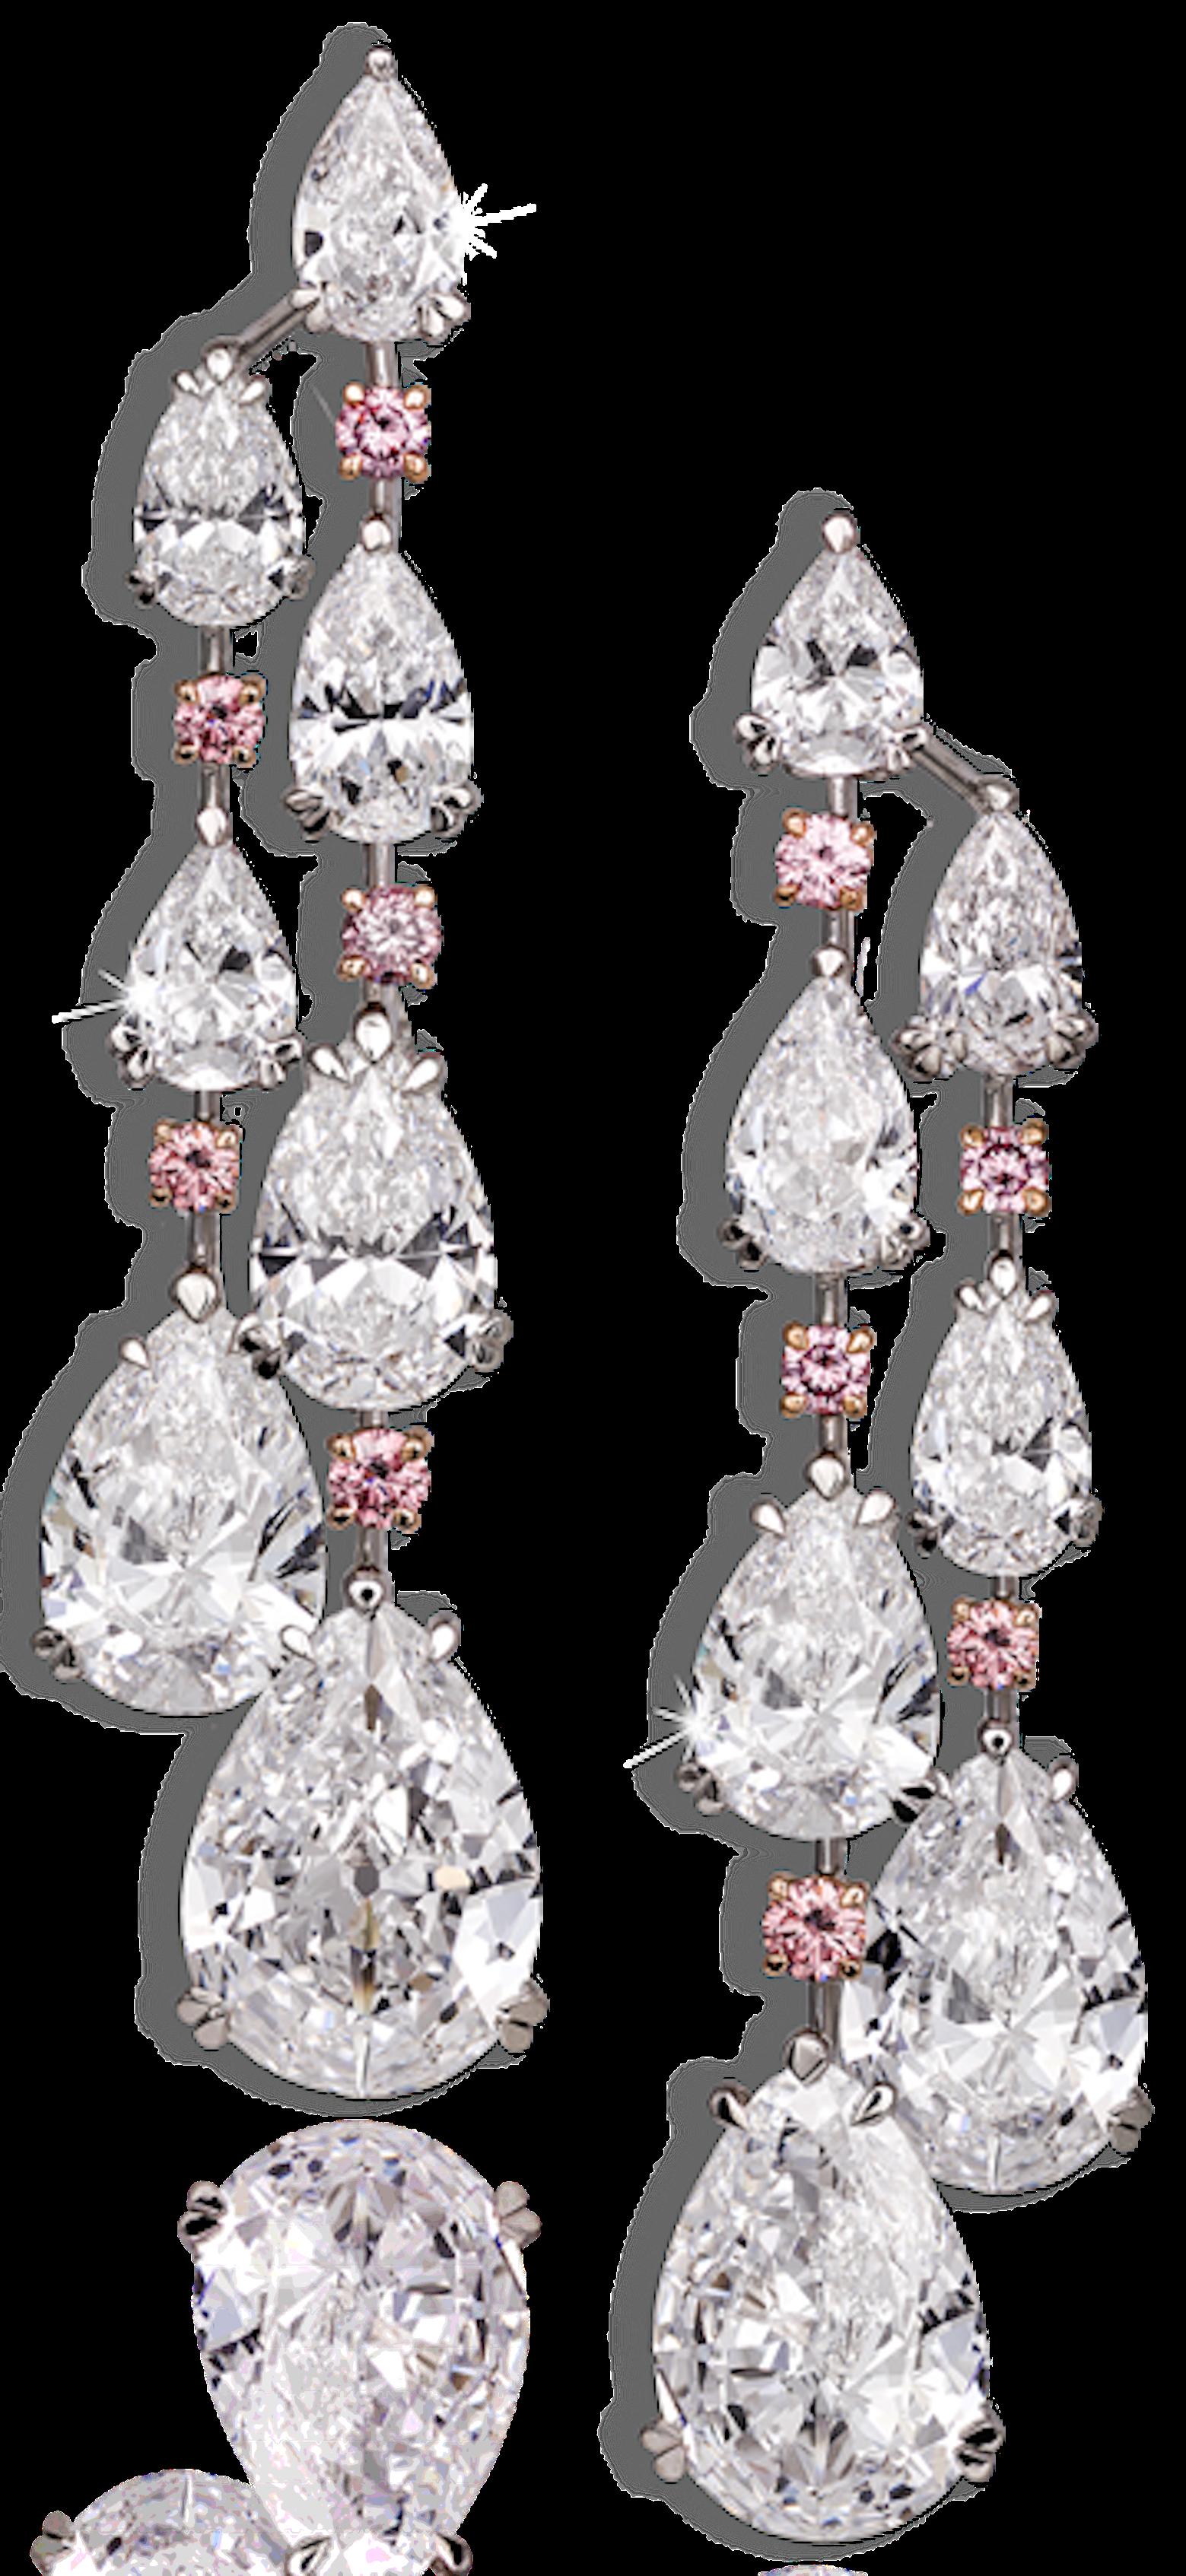 David morris important white diamond chandelier earrings david morris important white diamond chandelier earrings comprising dif pear shapes with vivid arubaitofo Images